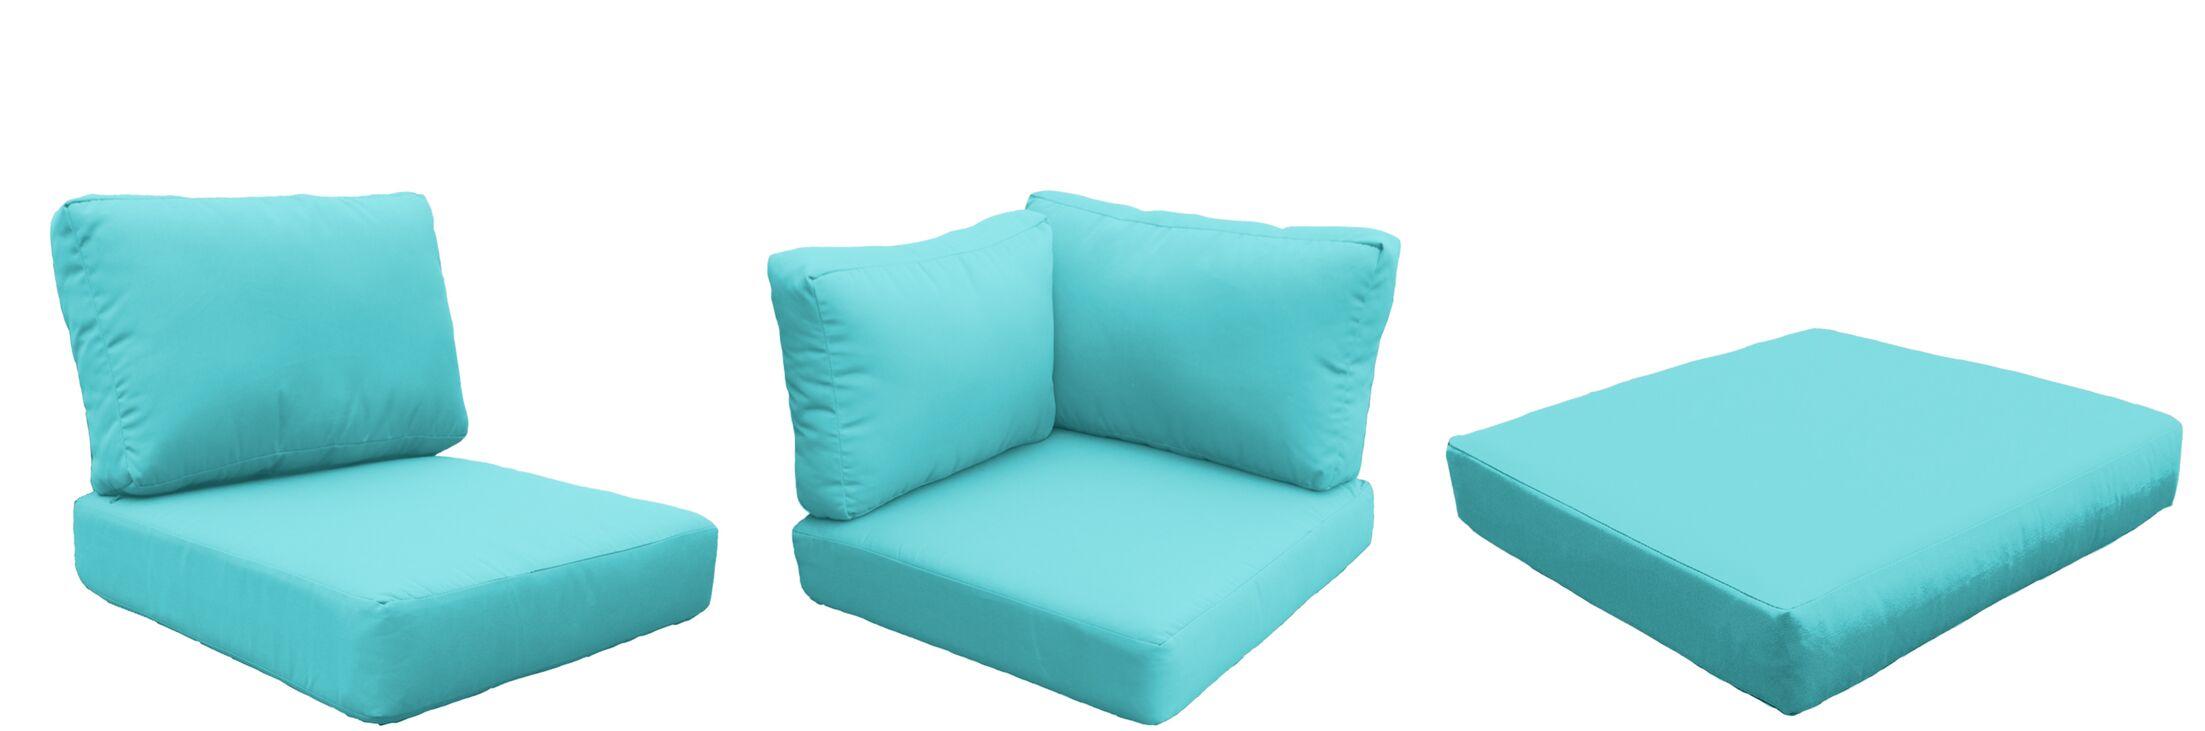 East Village Outdoor 23 Piece Lounge Chair Cushion Set Fabric: Aruba